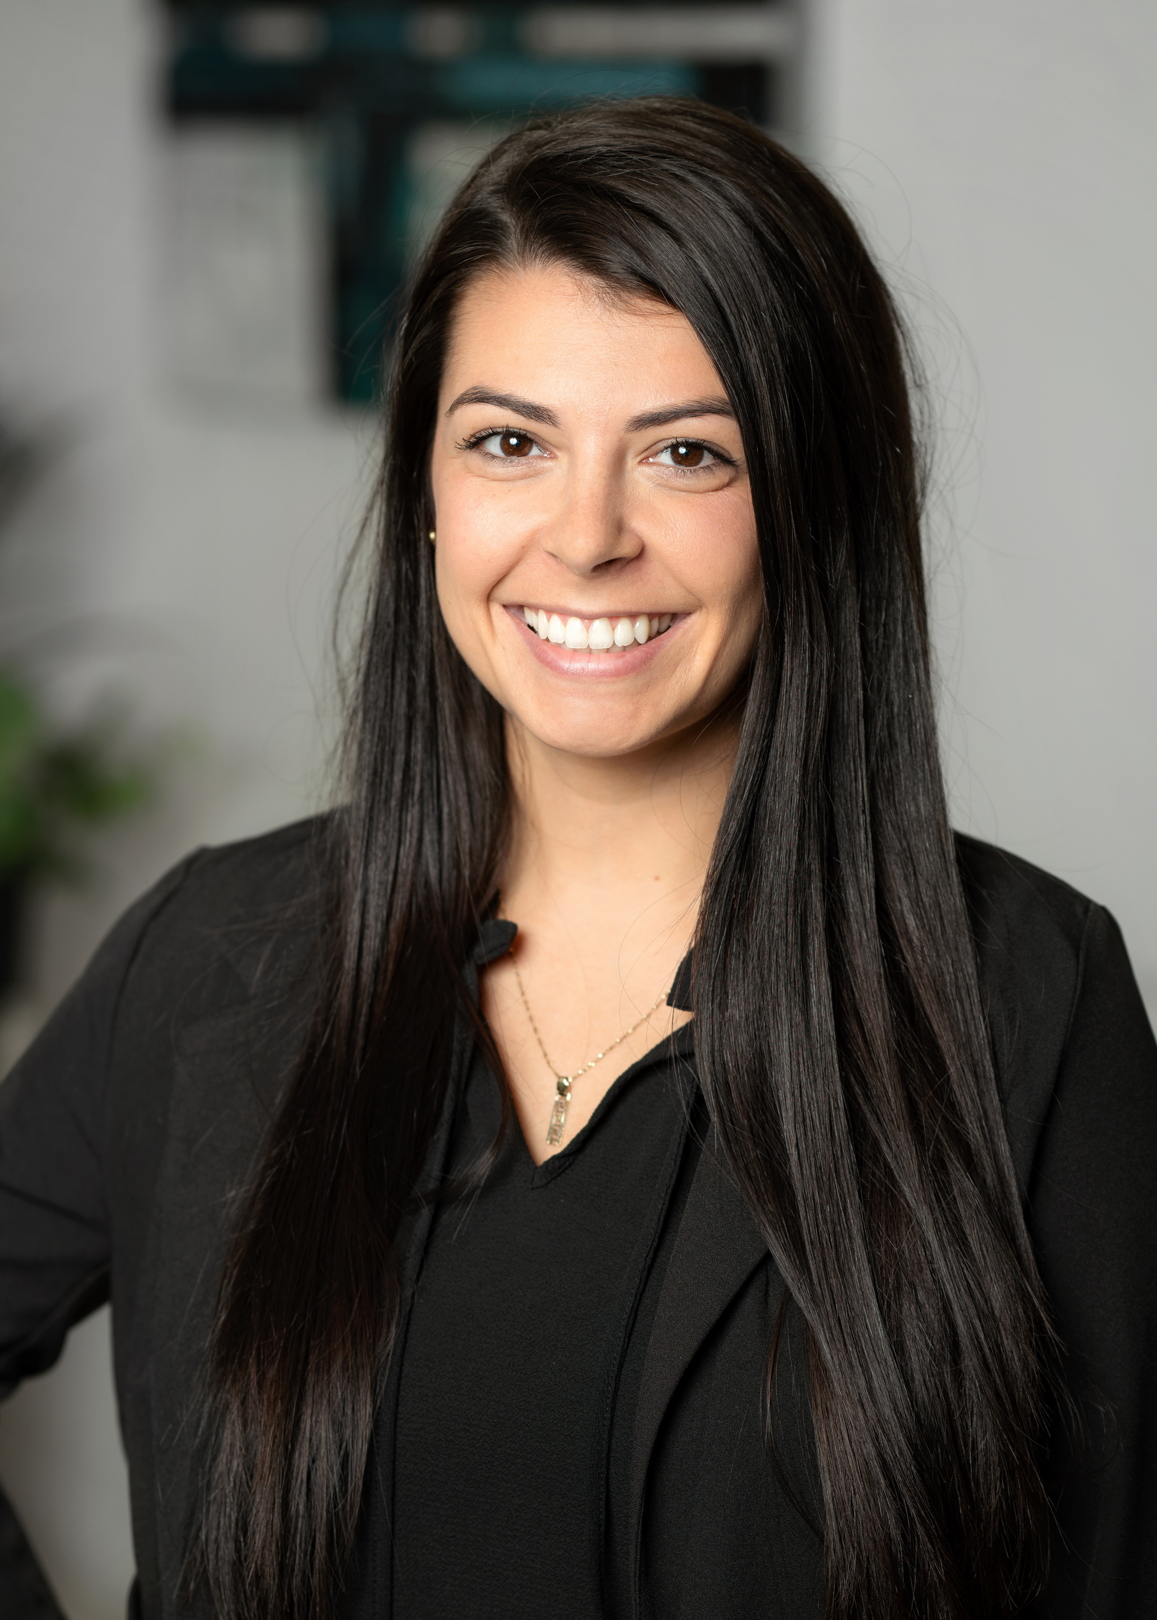 Cindy Castilloux